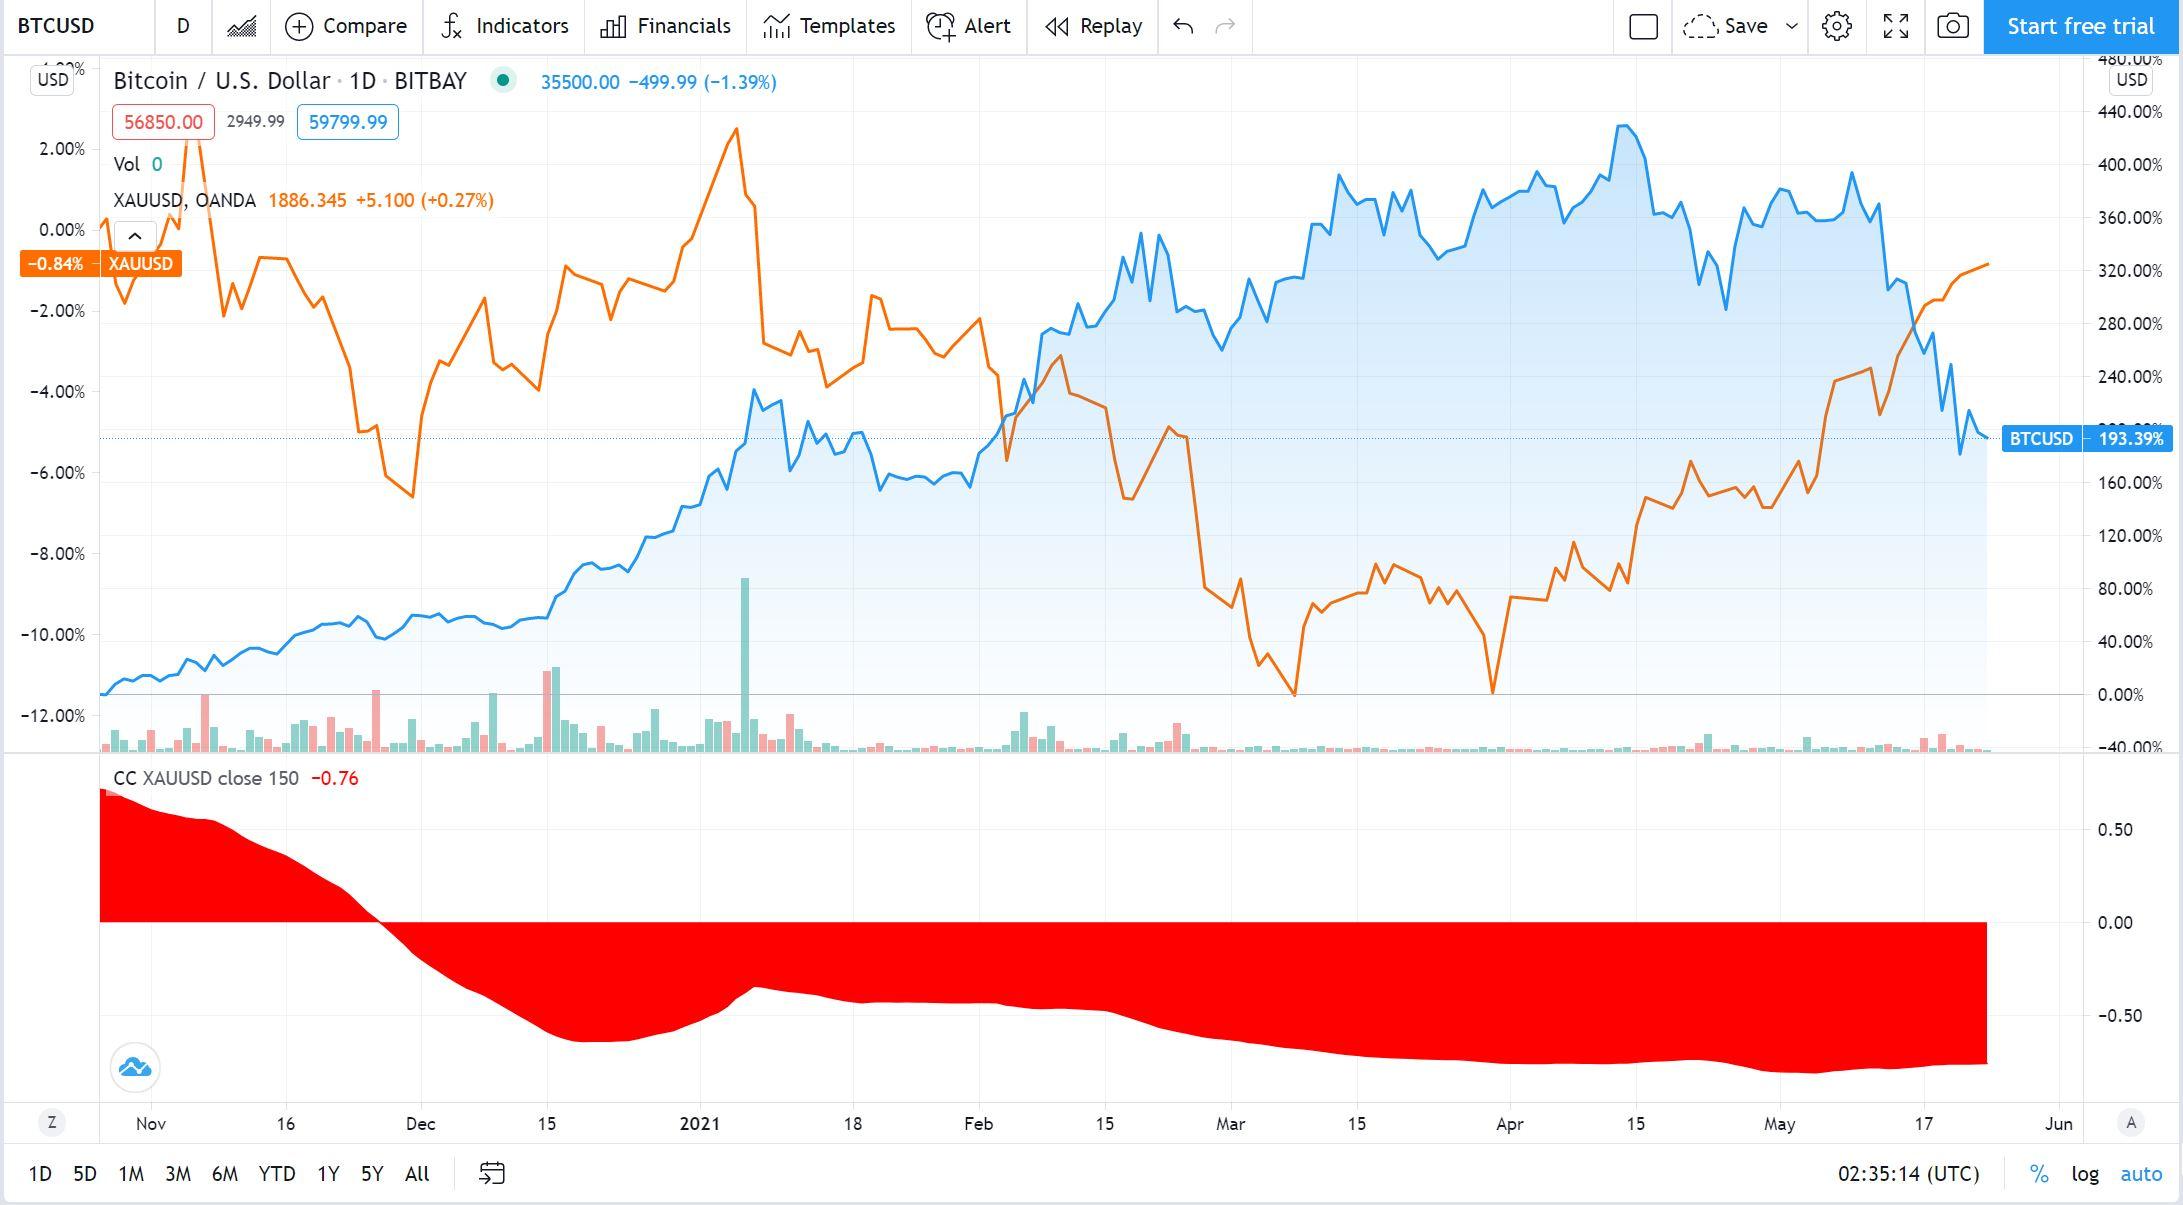 Bitcoin (BTC), crypto and gold price correlation